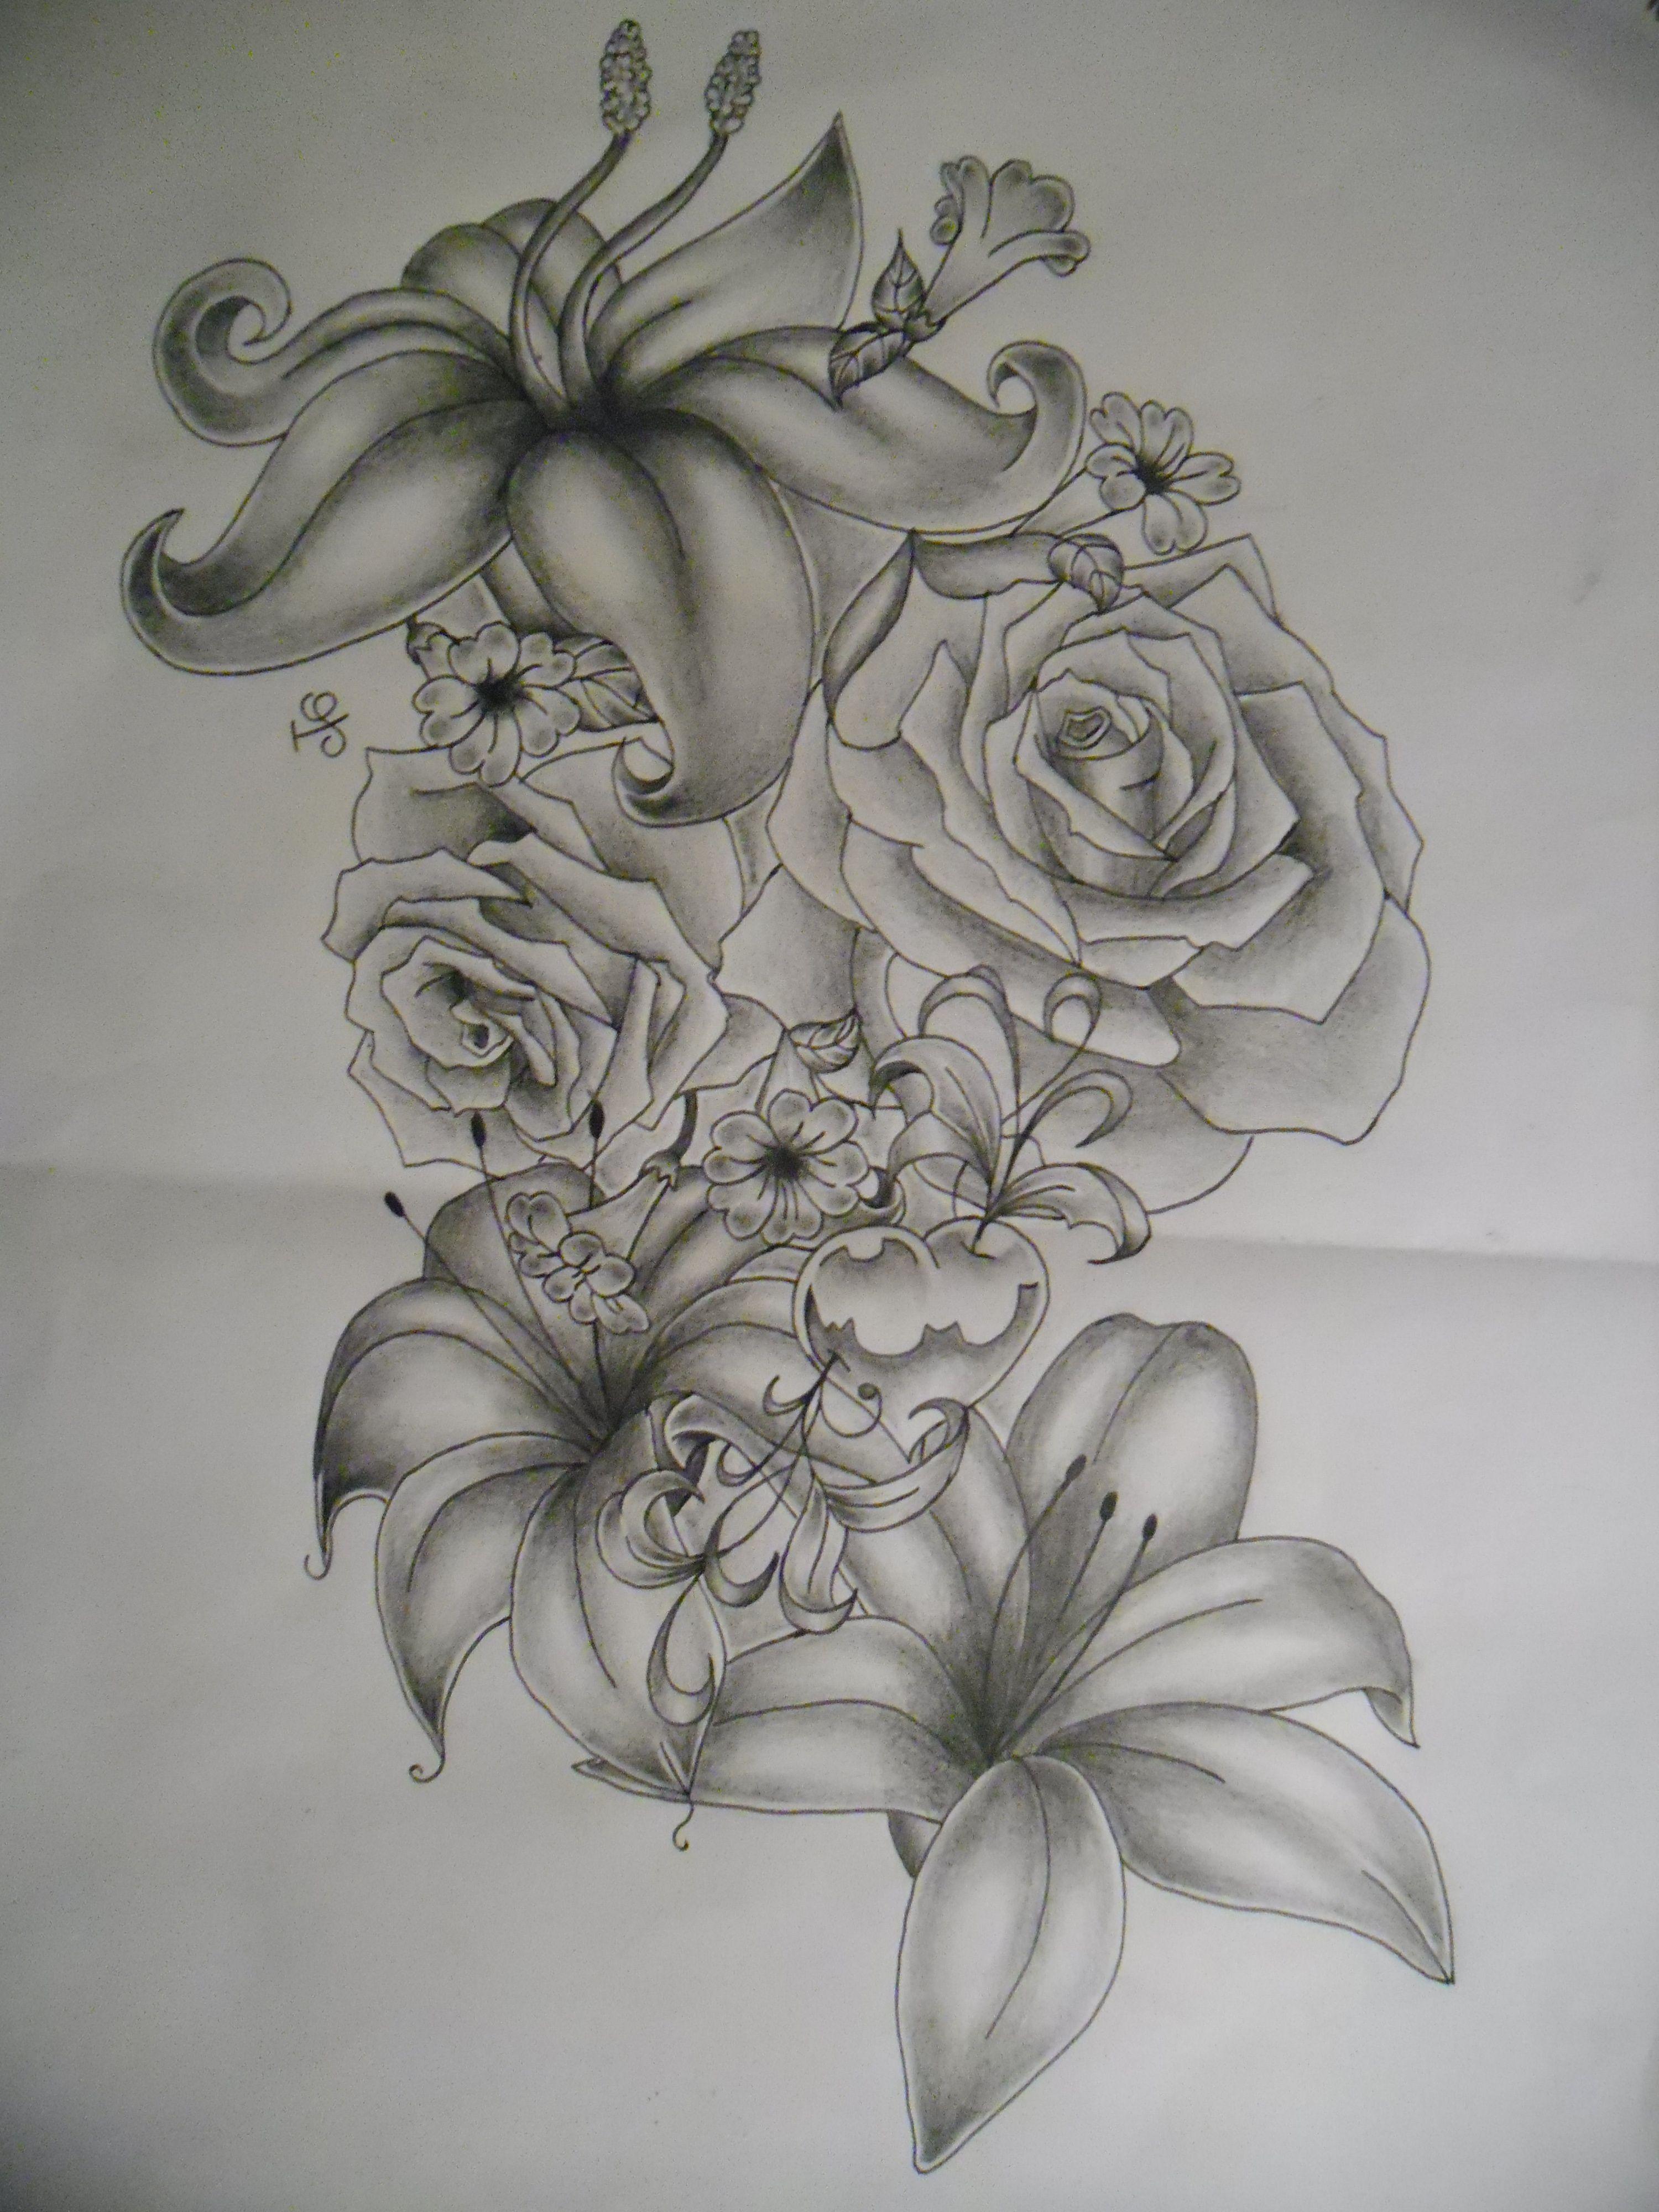 Flower Tattoo Designs | flowers tattoo design by tattoosuzette designs interfaces tattoo ...